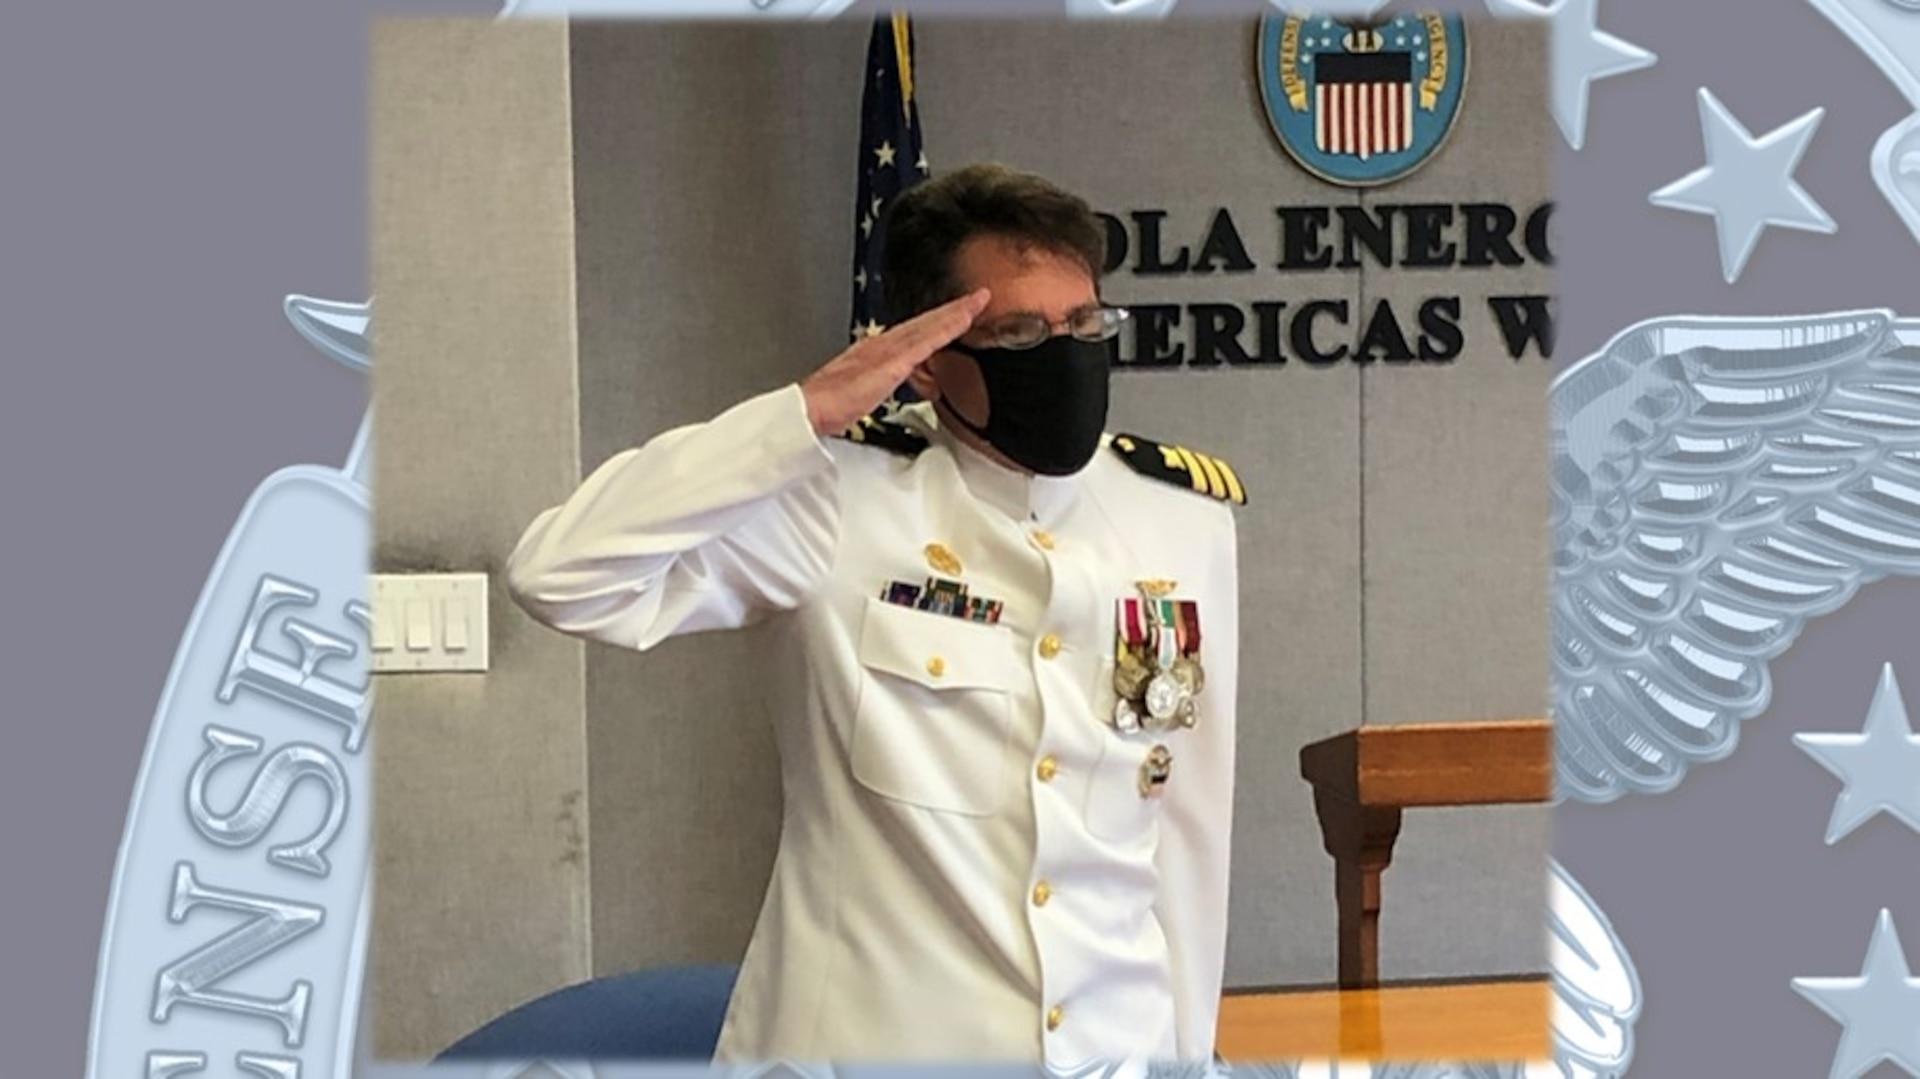 Navy Cmdr. Michael Wilson salutes